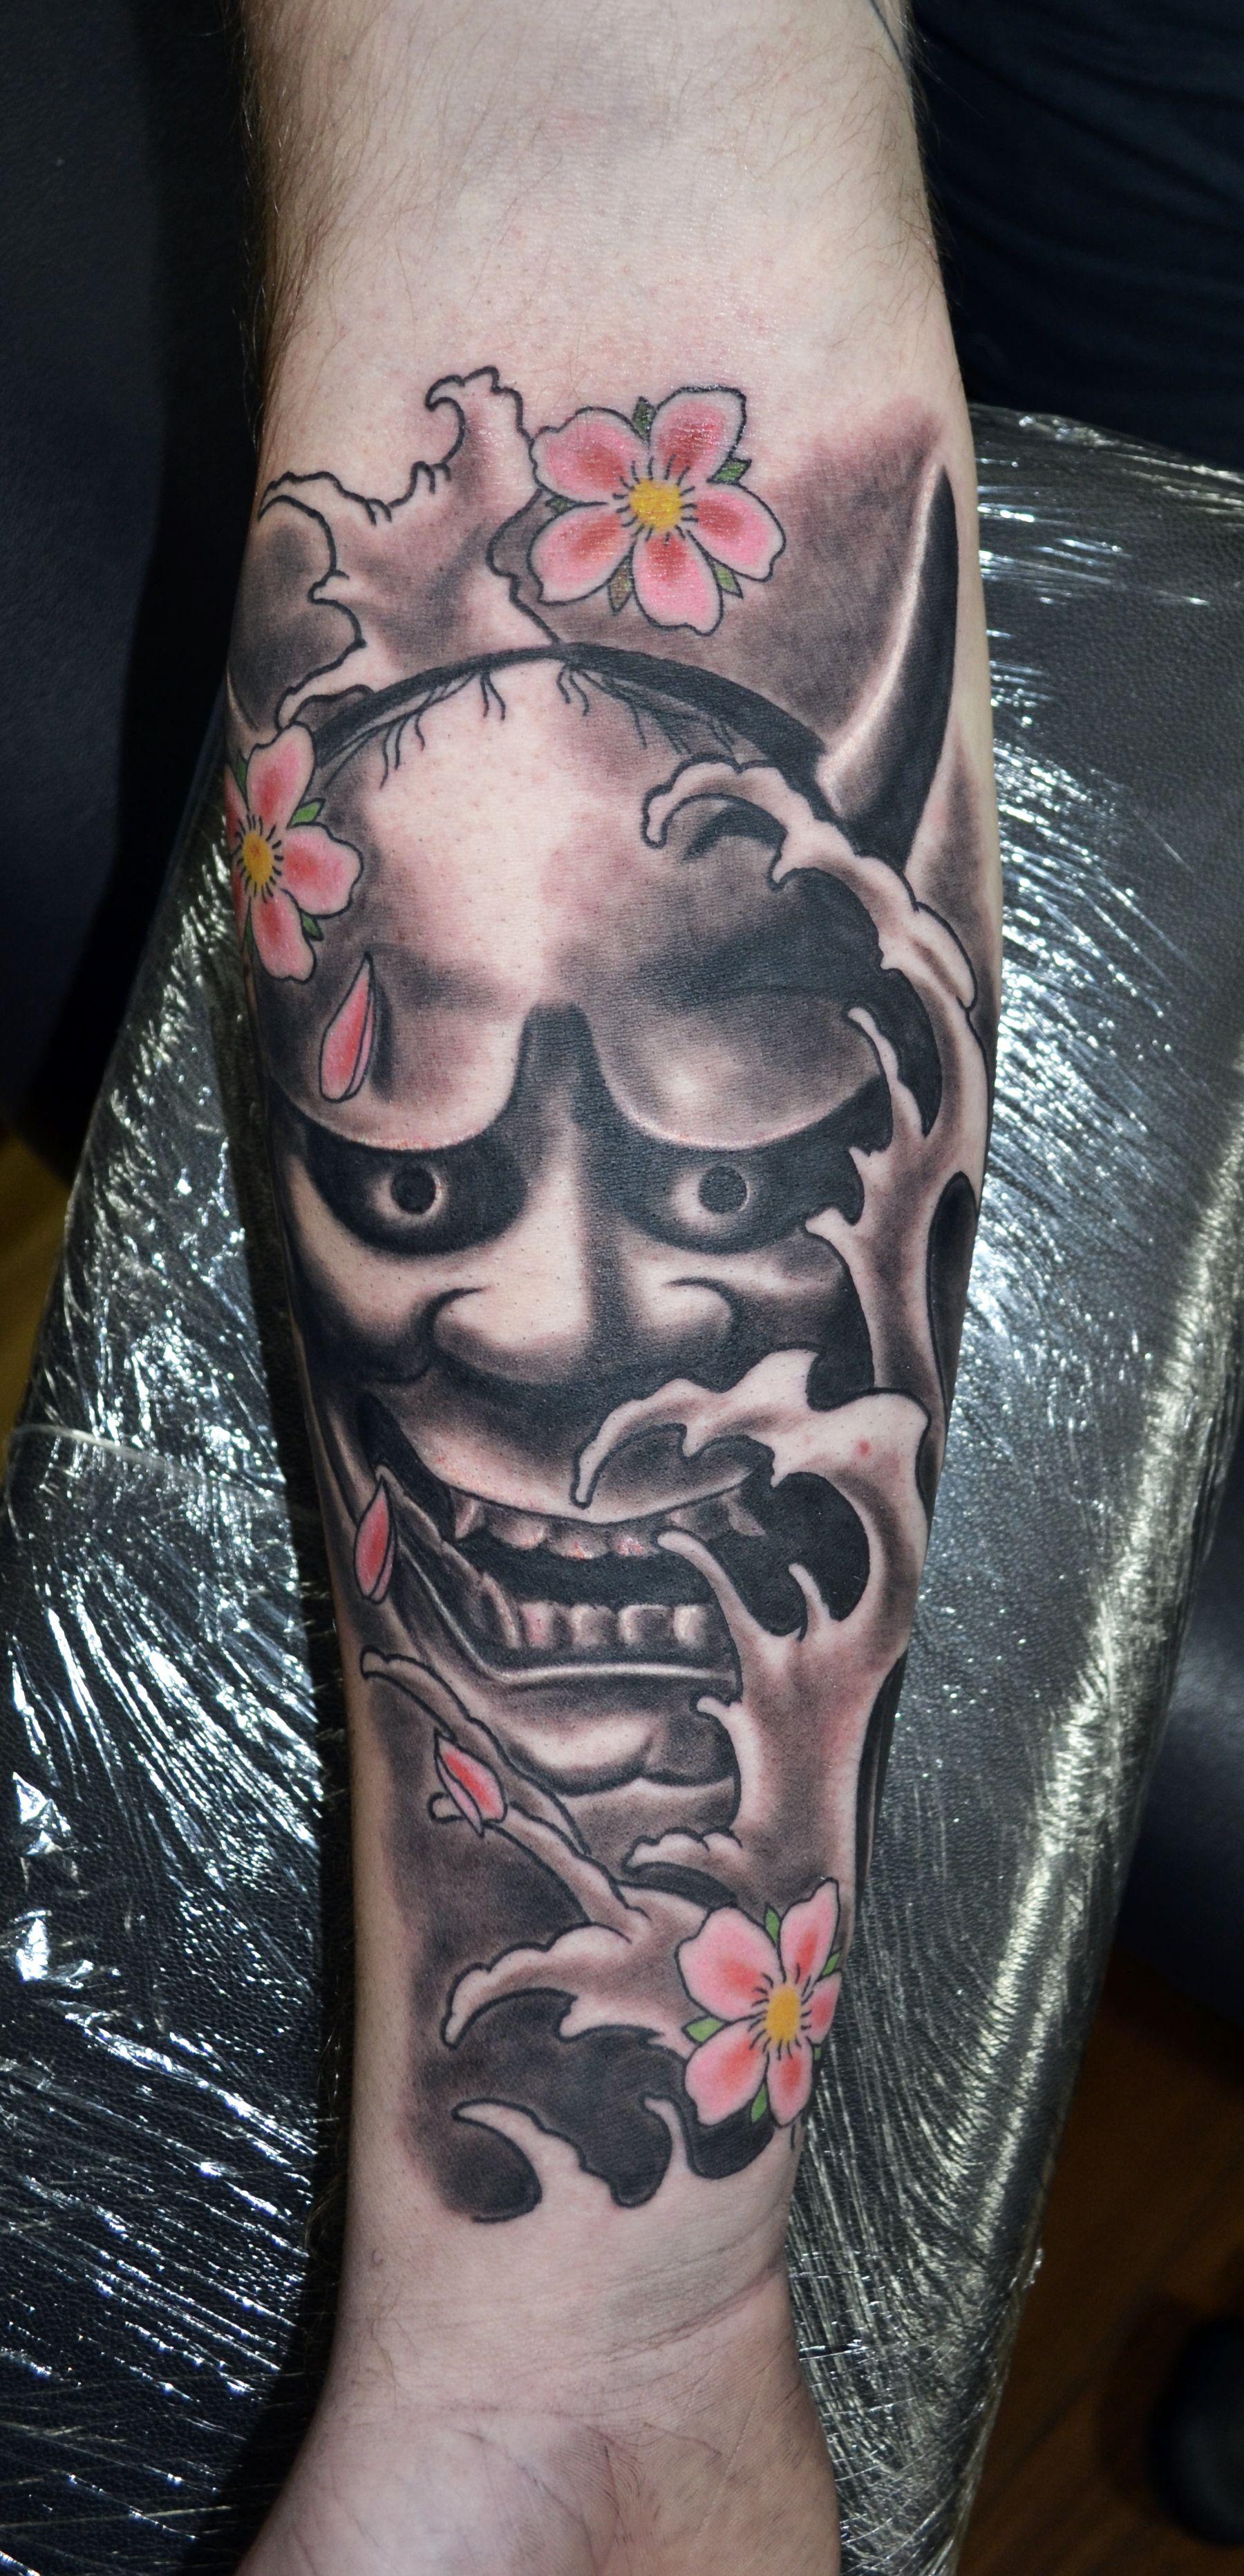 Hannya Mask Girl Tattoo: Japanese Hannya Mask Tattoo